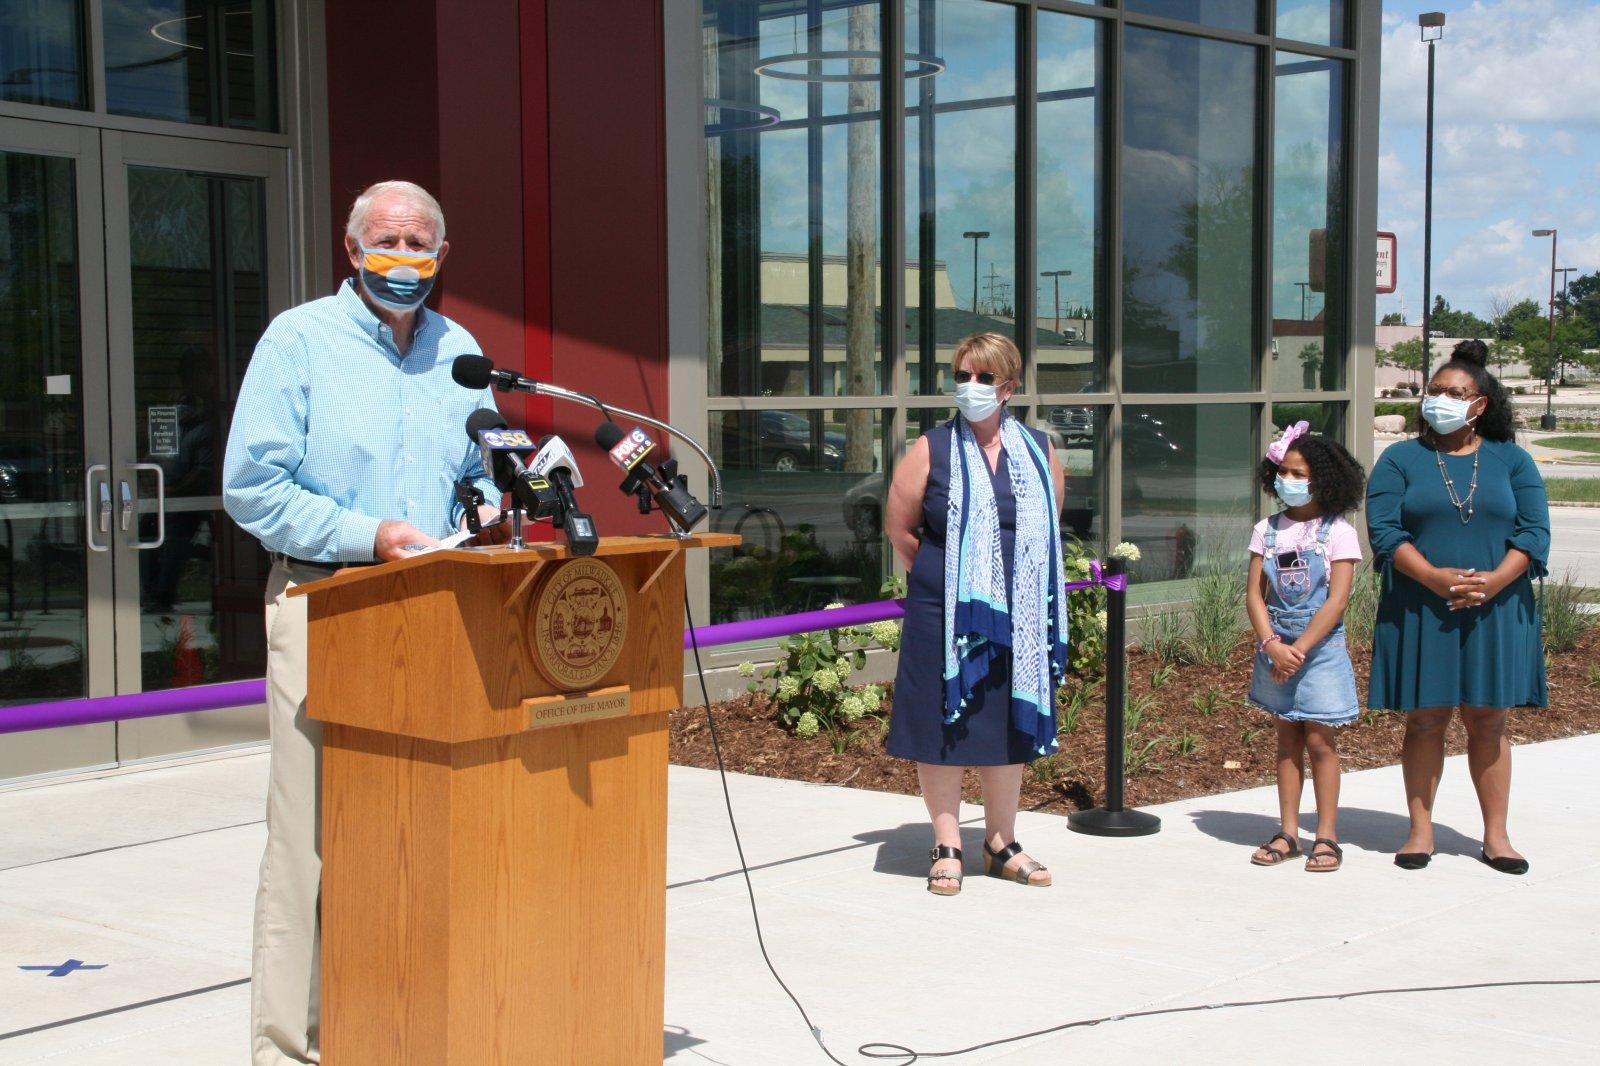 Mayor Tom Barrett, Paula Kiely and Ald. Chantia Lewis